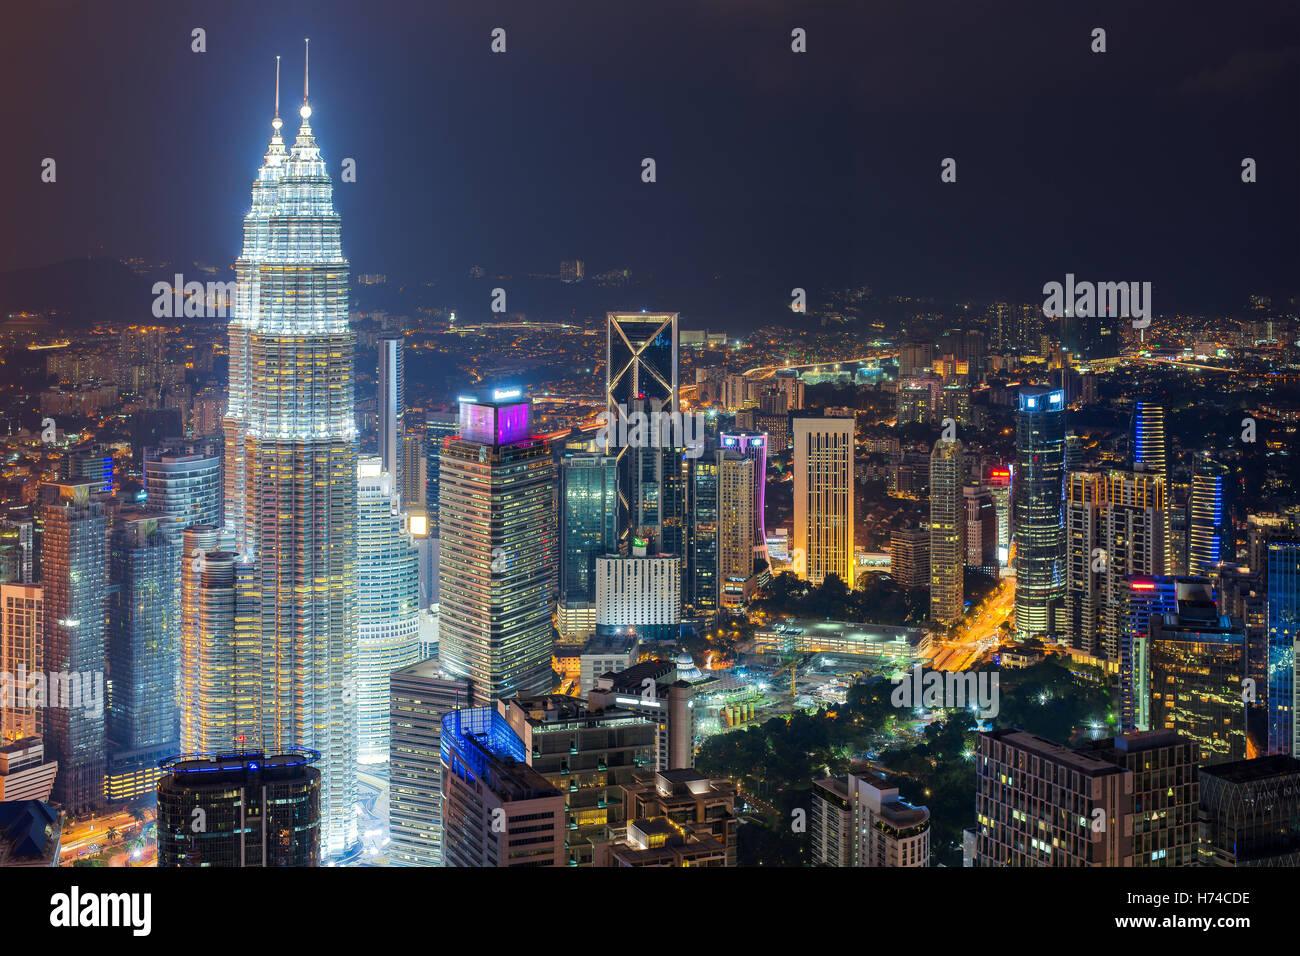 Kuala Lumpur skyline e grattacieli di notte a Kuala Lumpur, Malesia. Immagini Stock